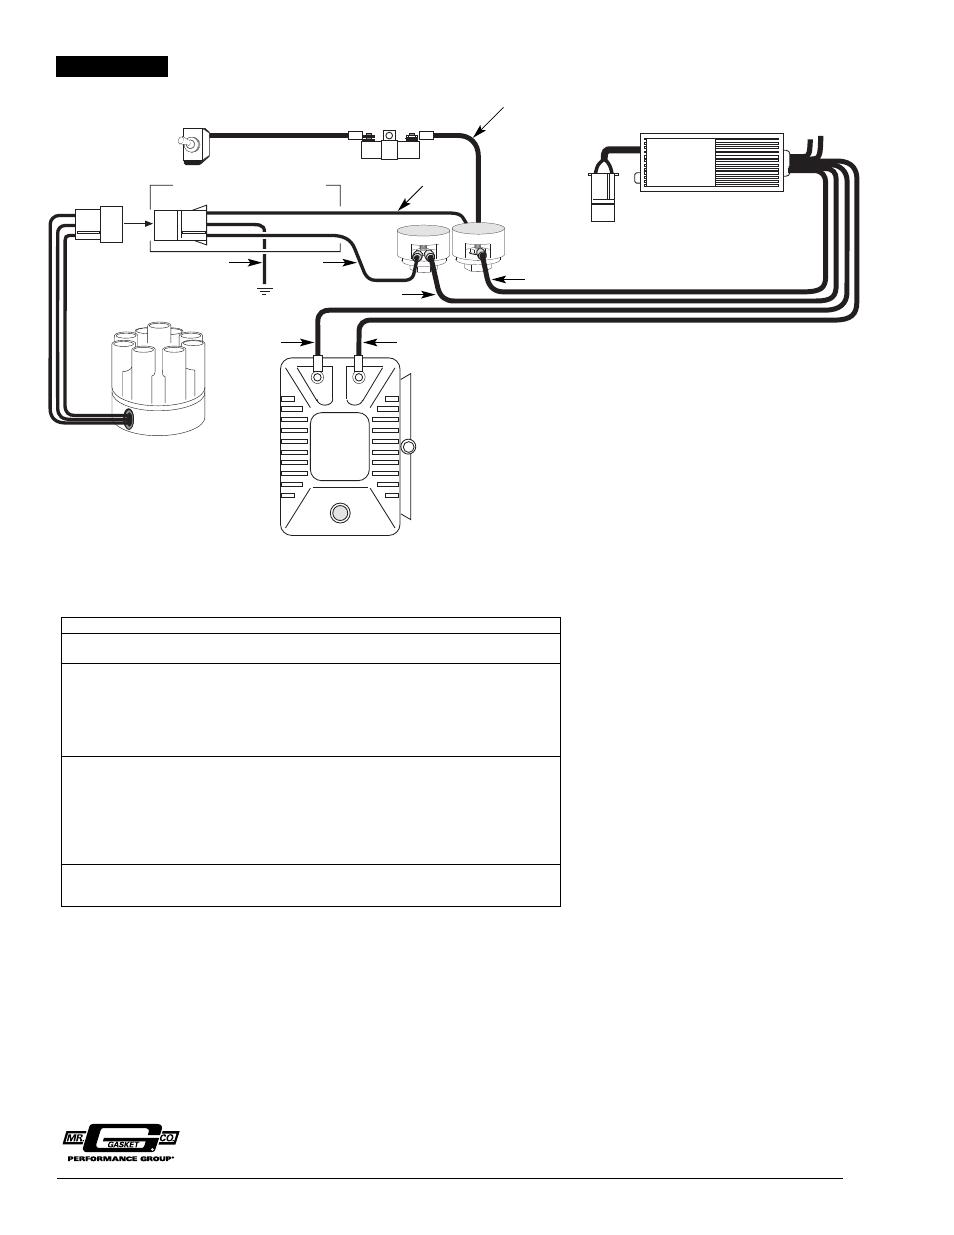 Mallory Unilite Distributor Wiring Diagram : mallory, unilite, distributor, wiring, diagram, Mallory, Ignition, UNILITE, DISTRIBUTOR, Manual, Original